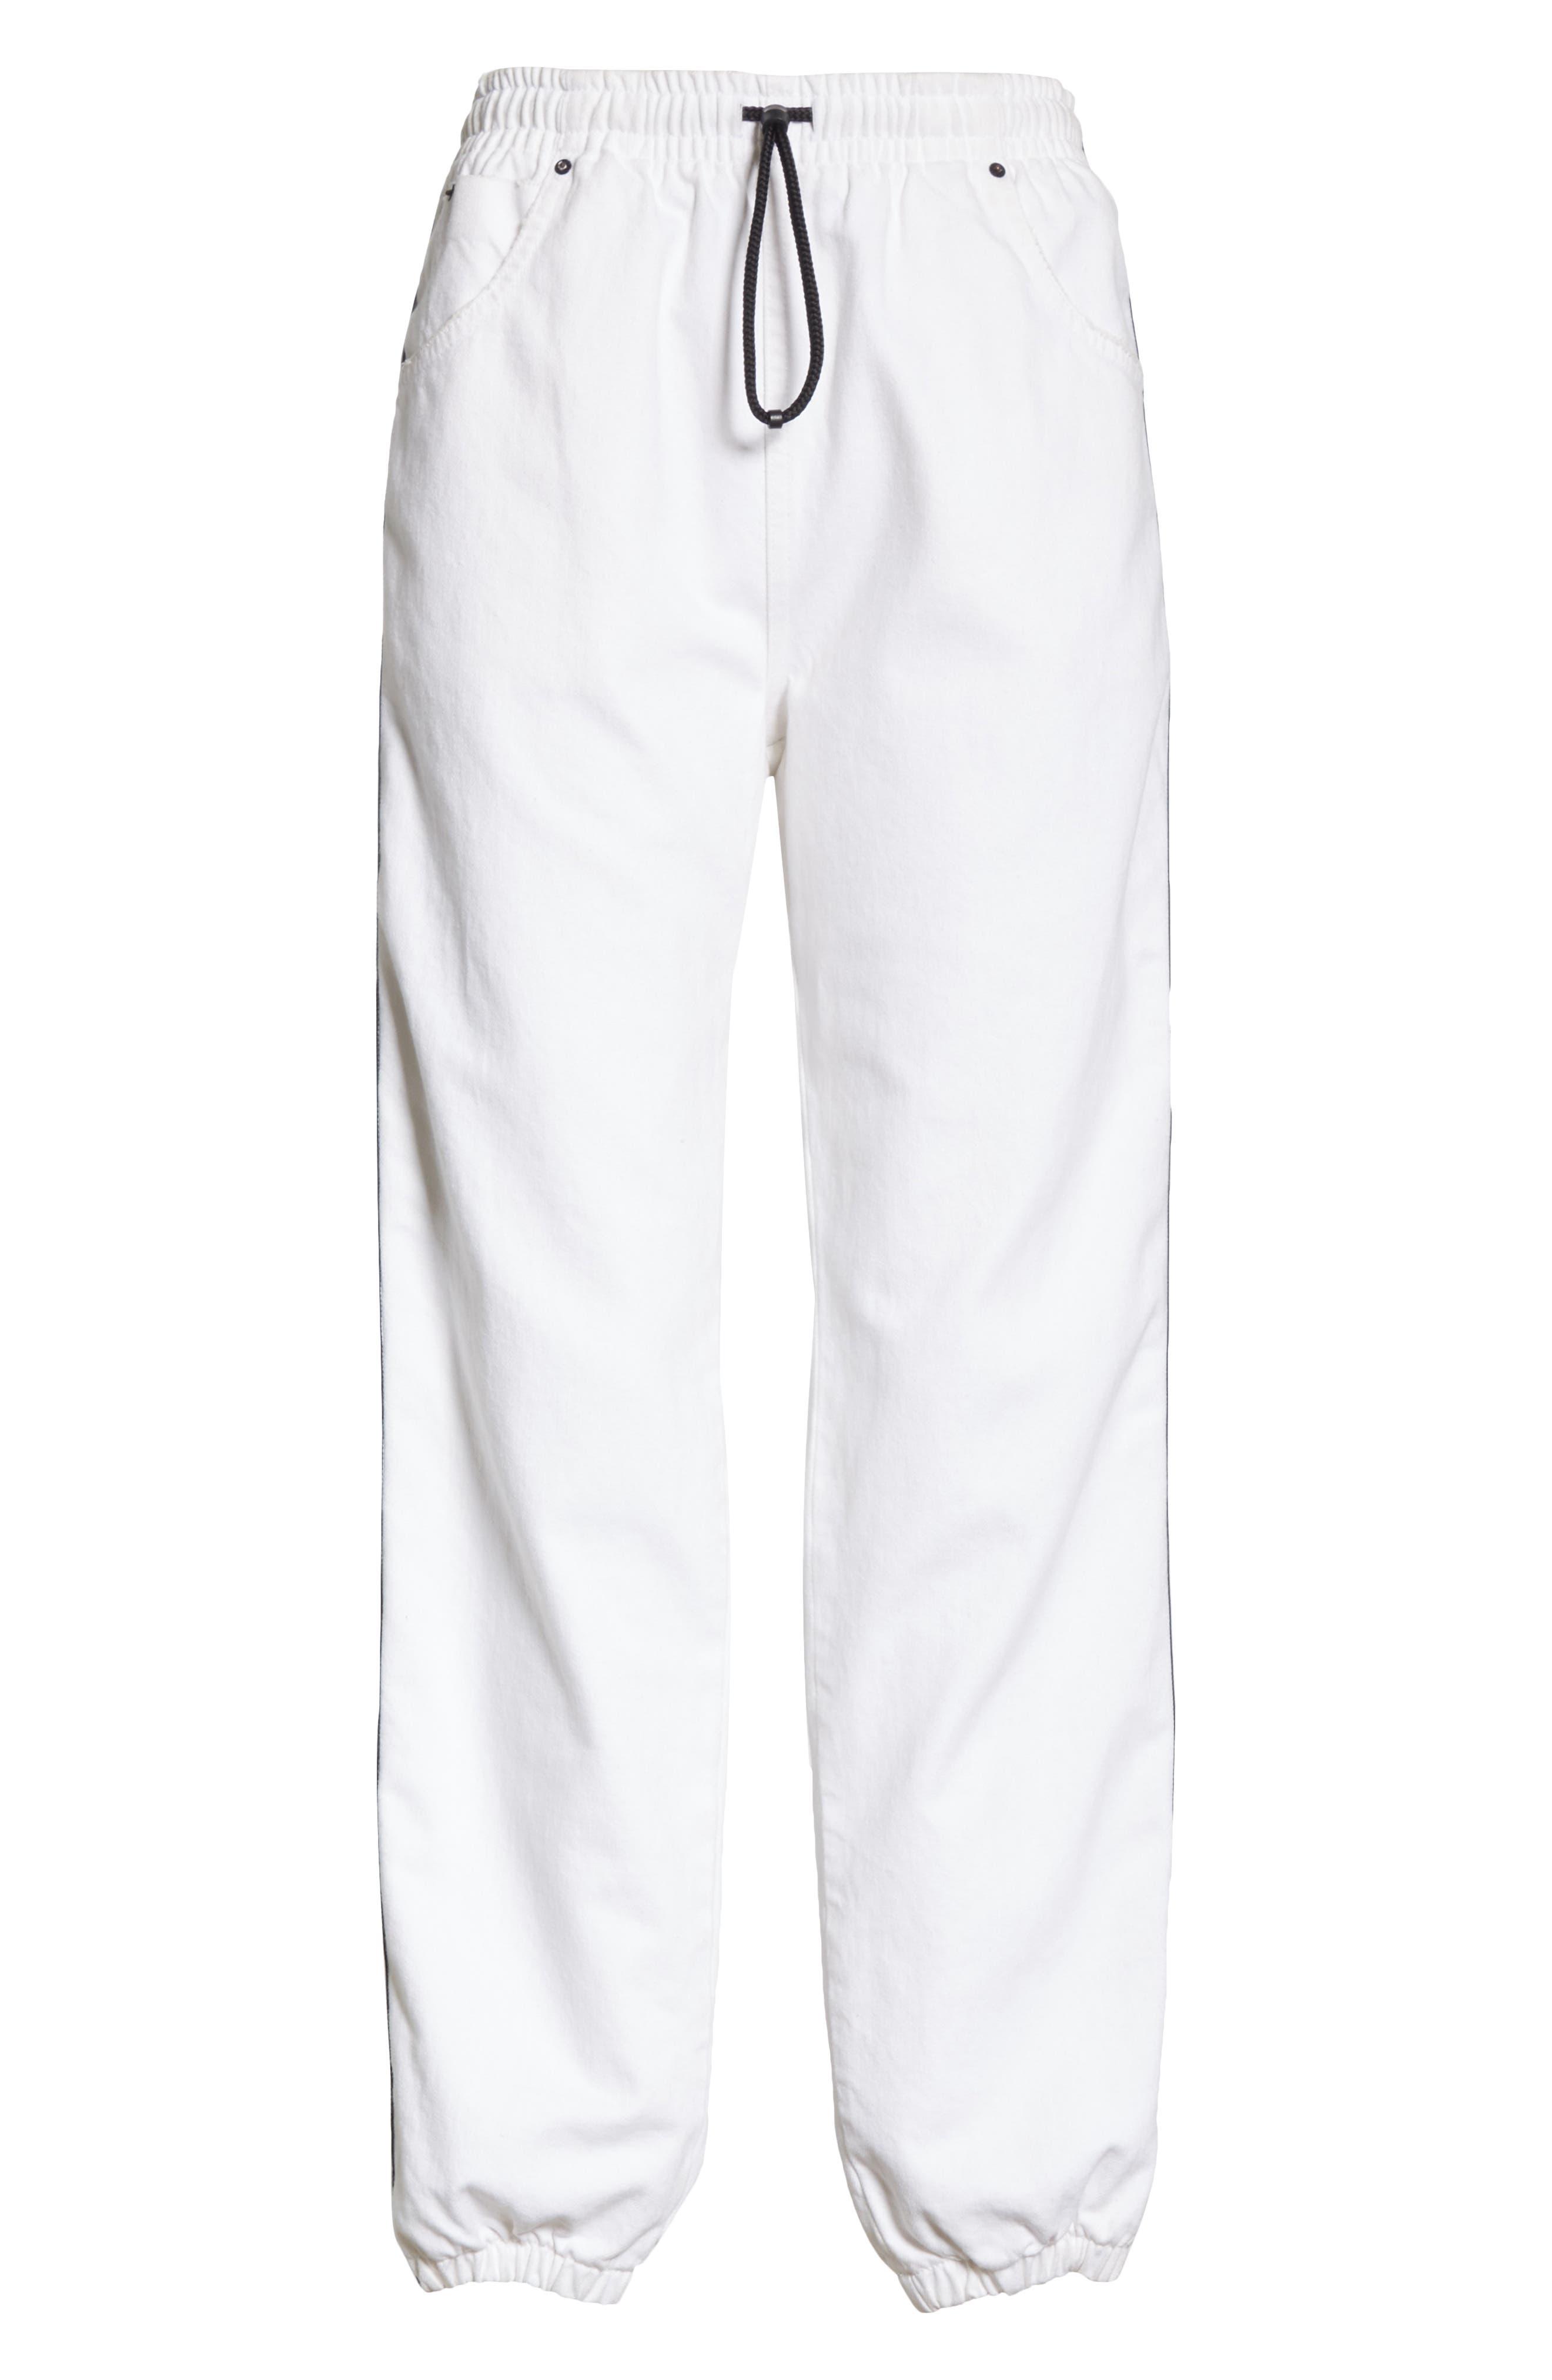 ALEXANDERWANG.T, Logo Stripe Track Pants, Alternate thumbnail 7, color, OPTIC WHITE